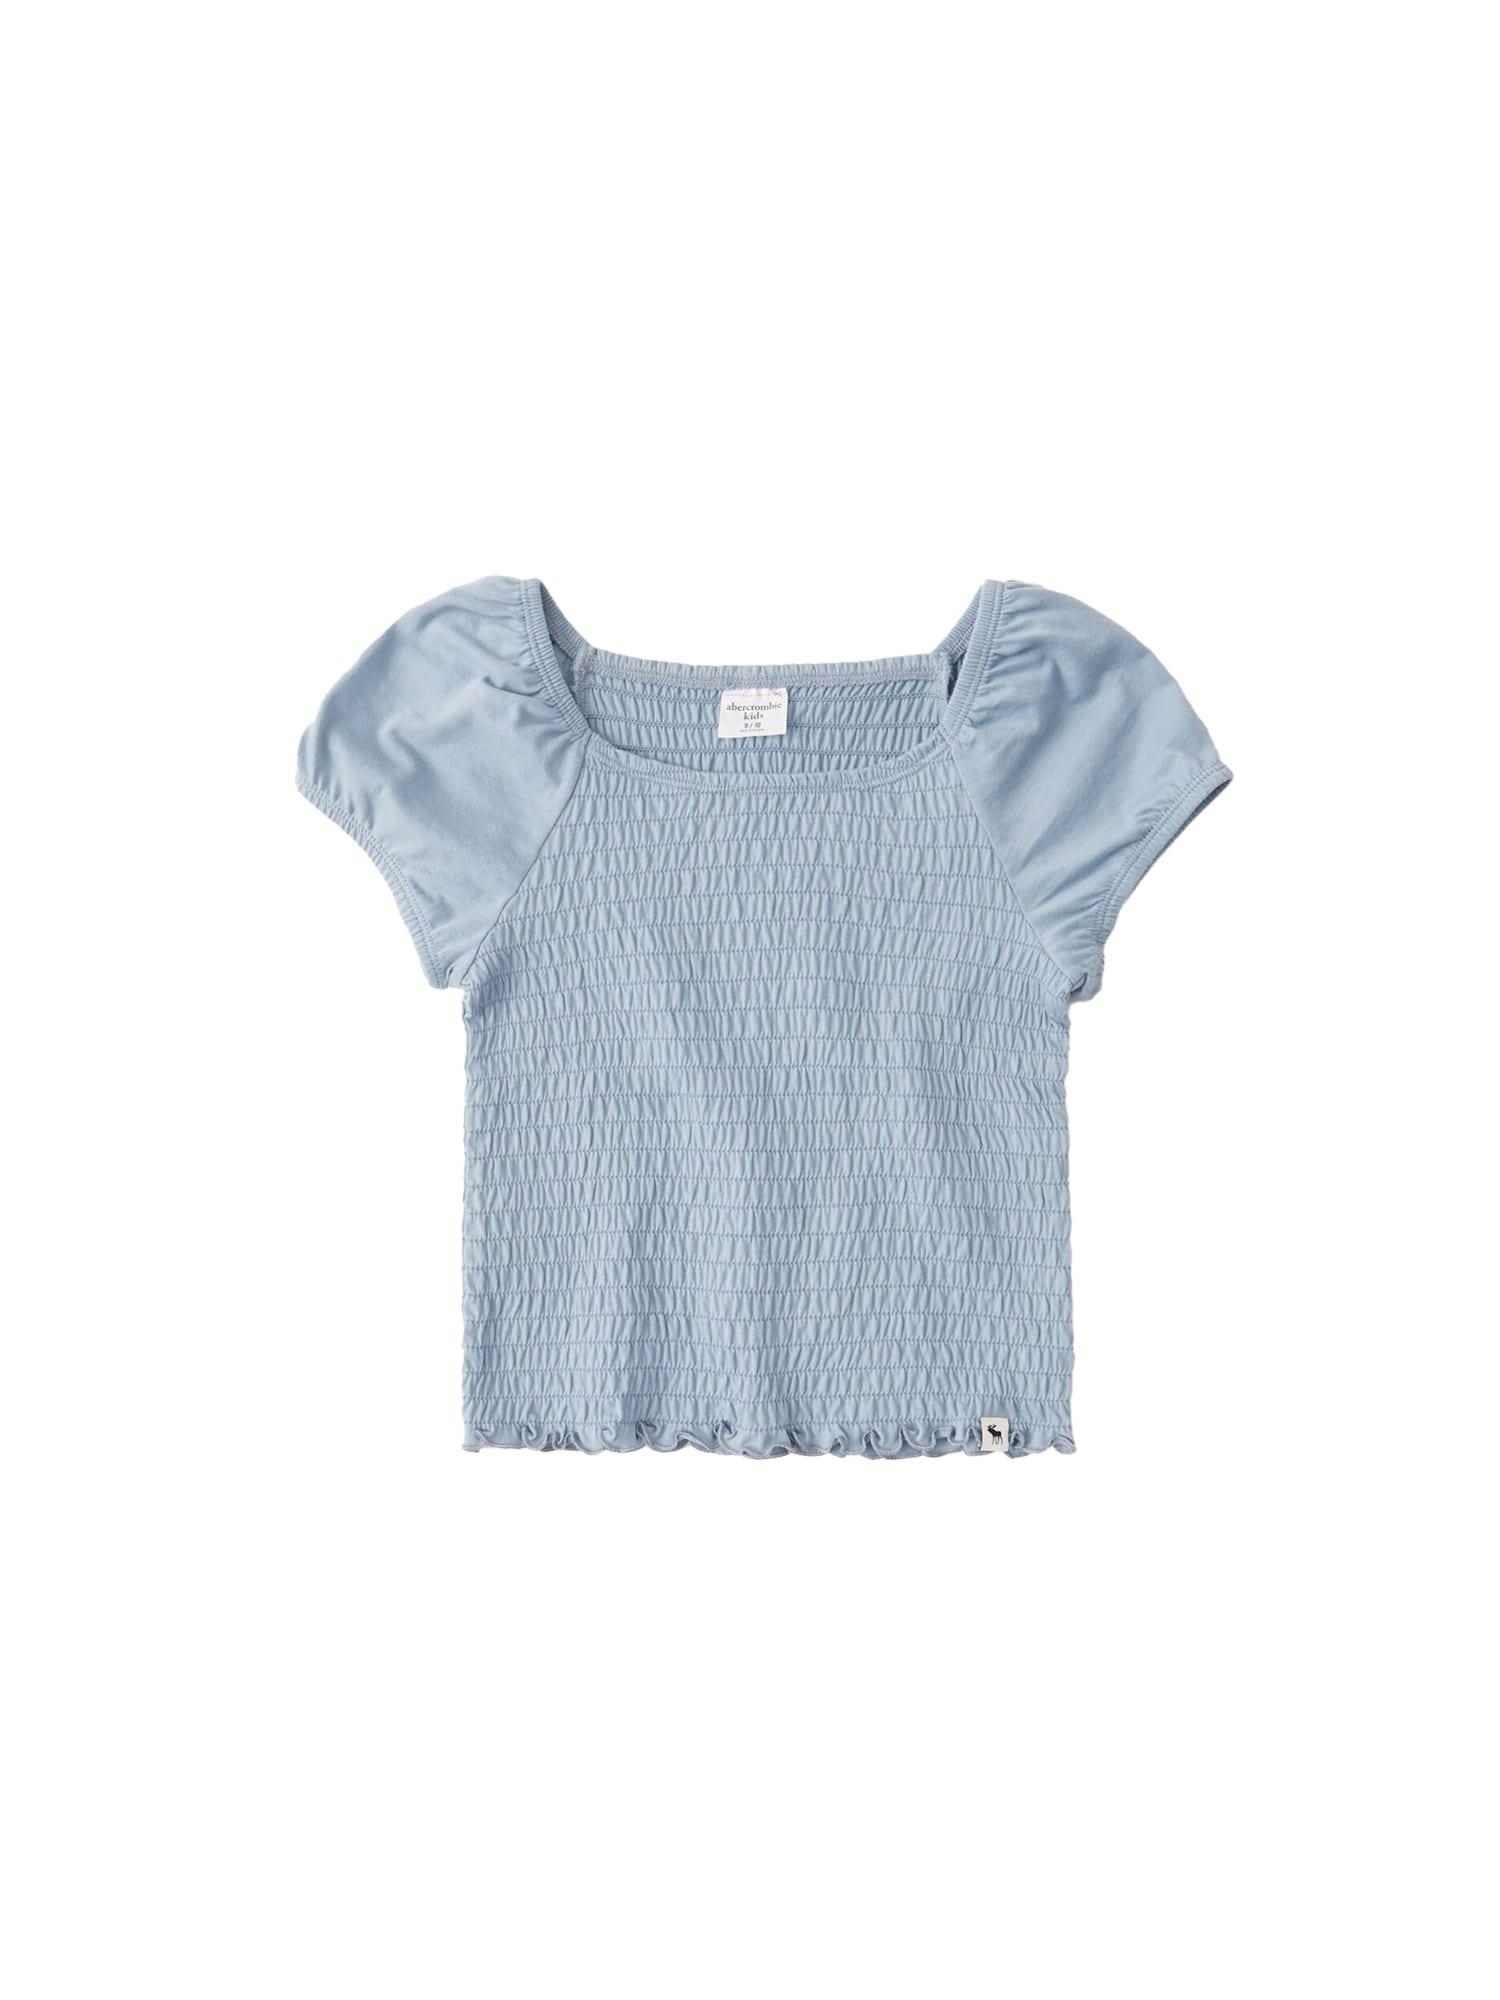 Abercrombie & Fitch Marškinėliai mėlyna dūmų spalva